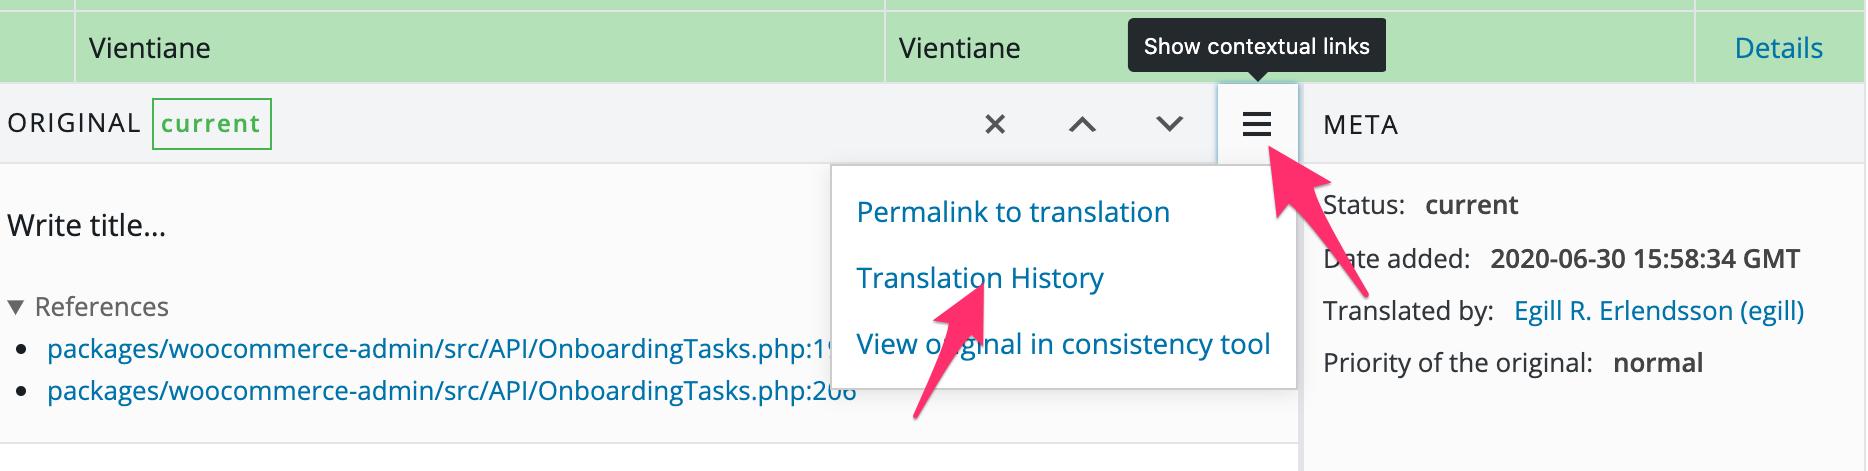 translation-history